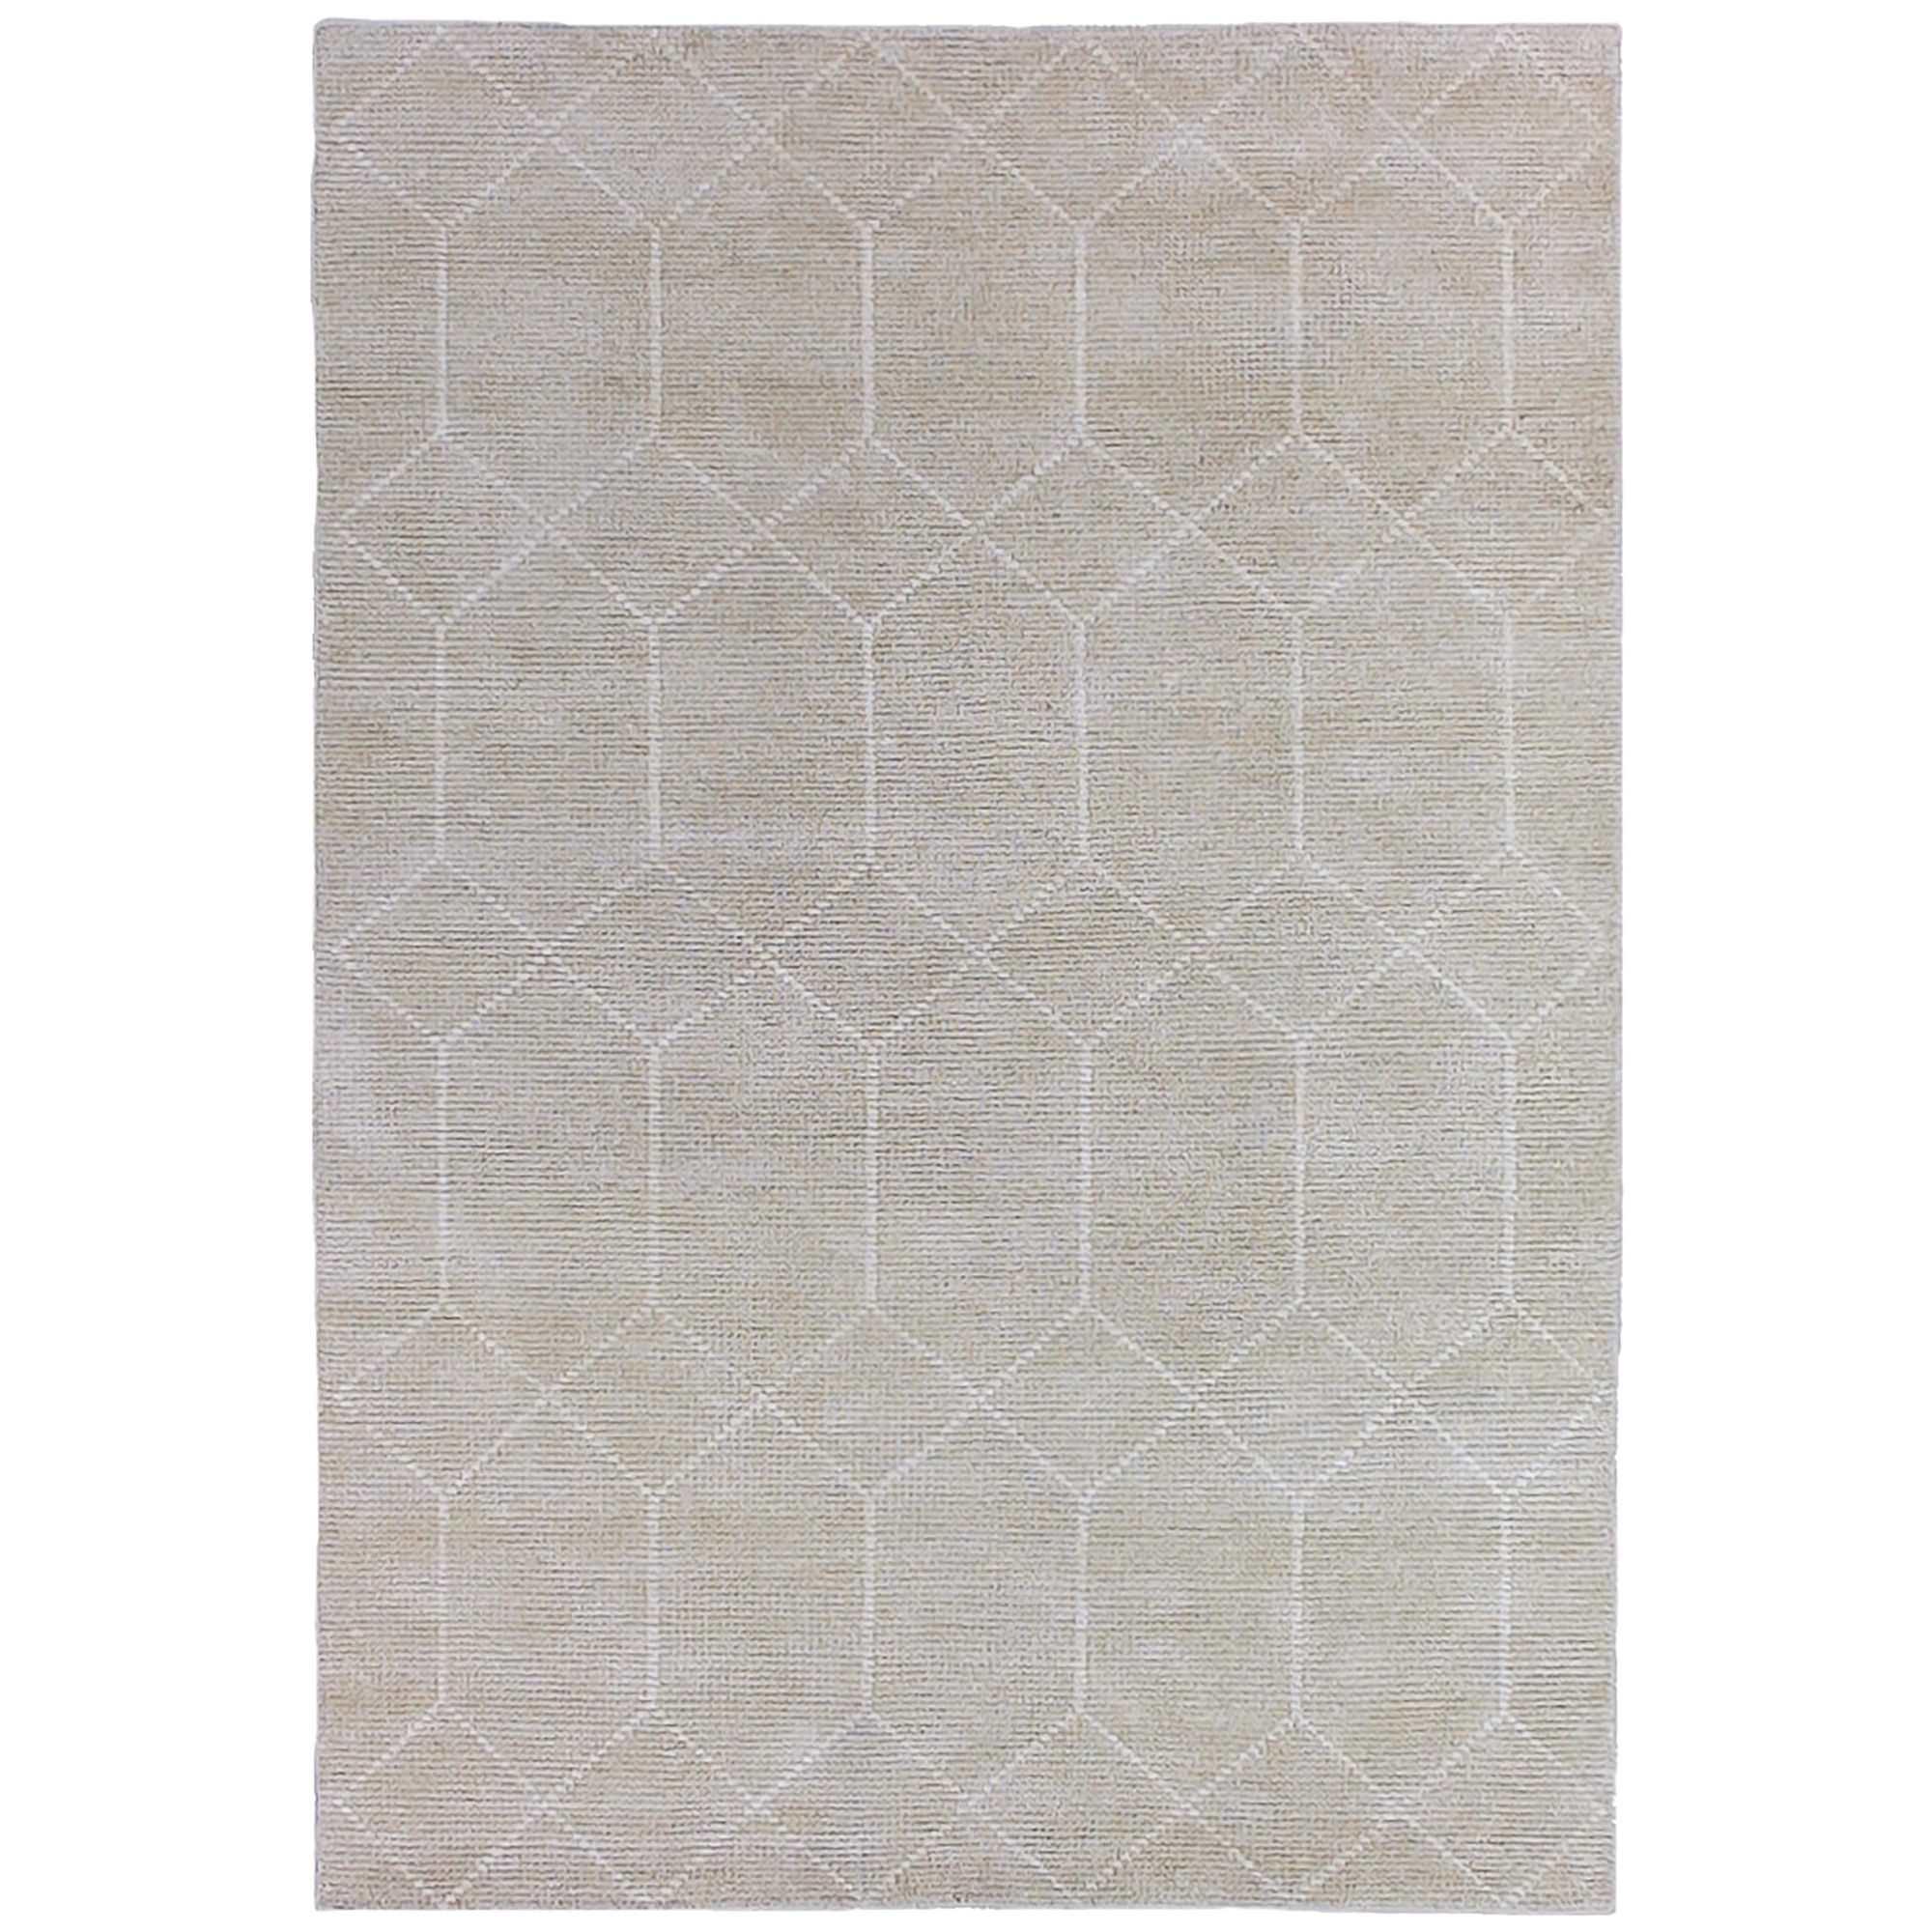 Geometrics Hand Knotted Wool Rug, 200x300cm, Silvery Beige